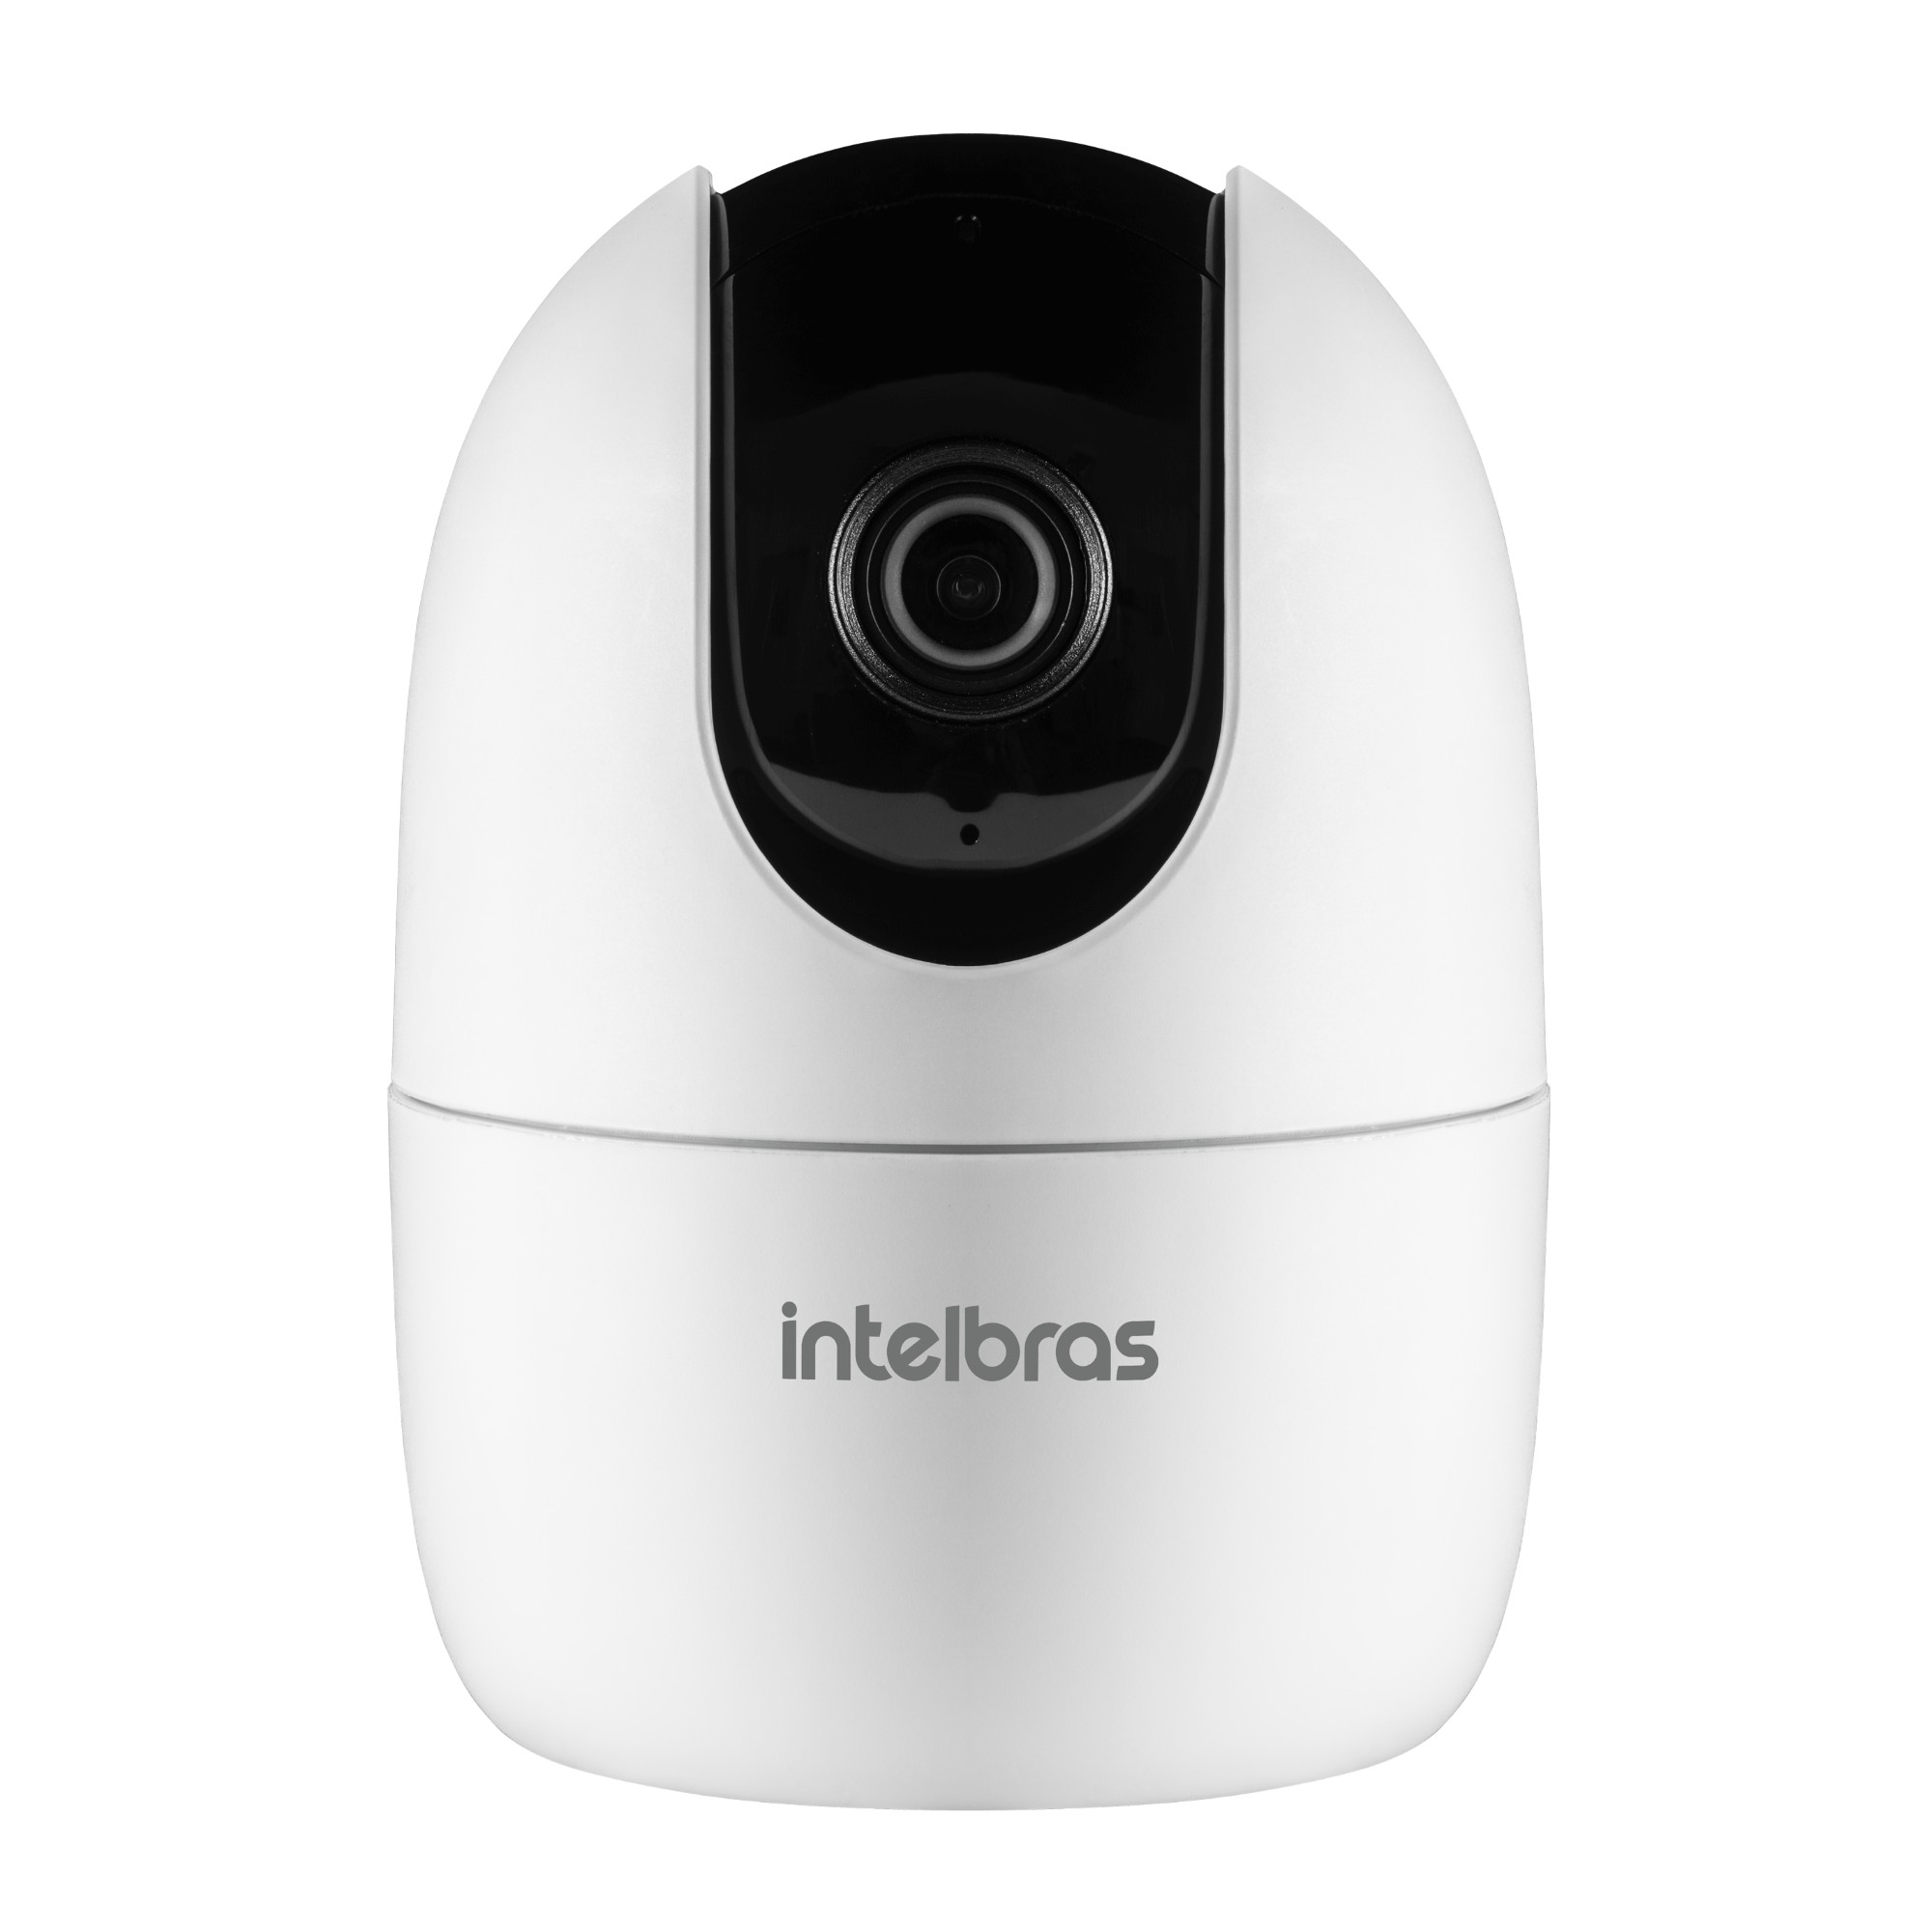 Camera de Seguranca Smart 360 Intelbras Wifi Full HD Alexa e Google Assistente IM4 Branca